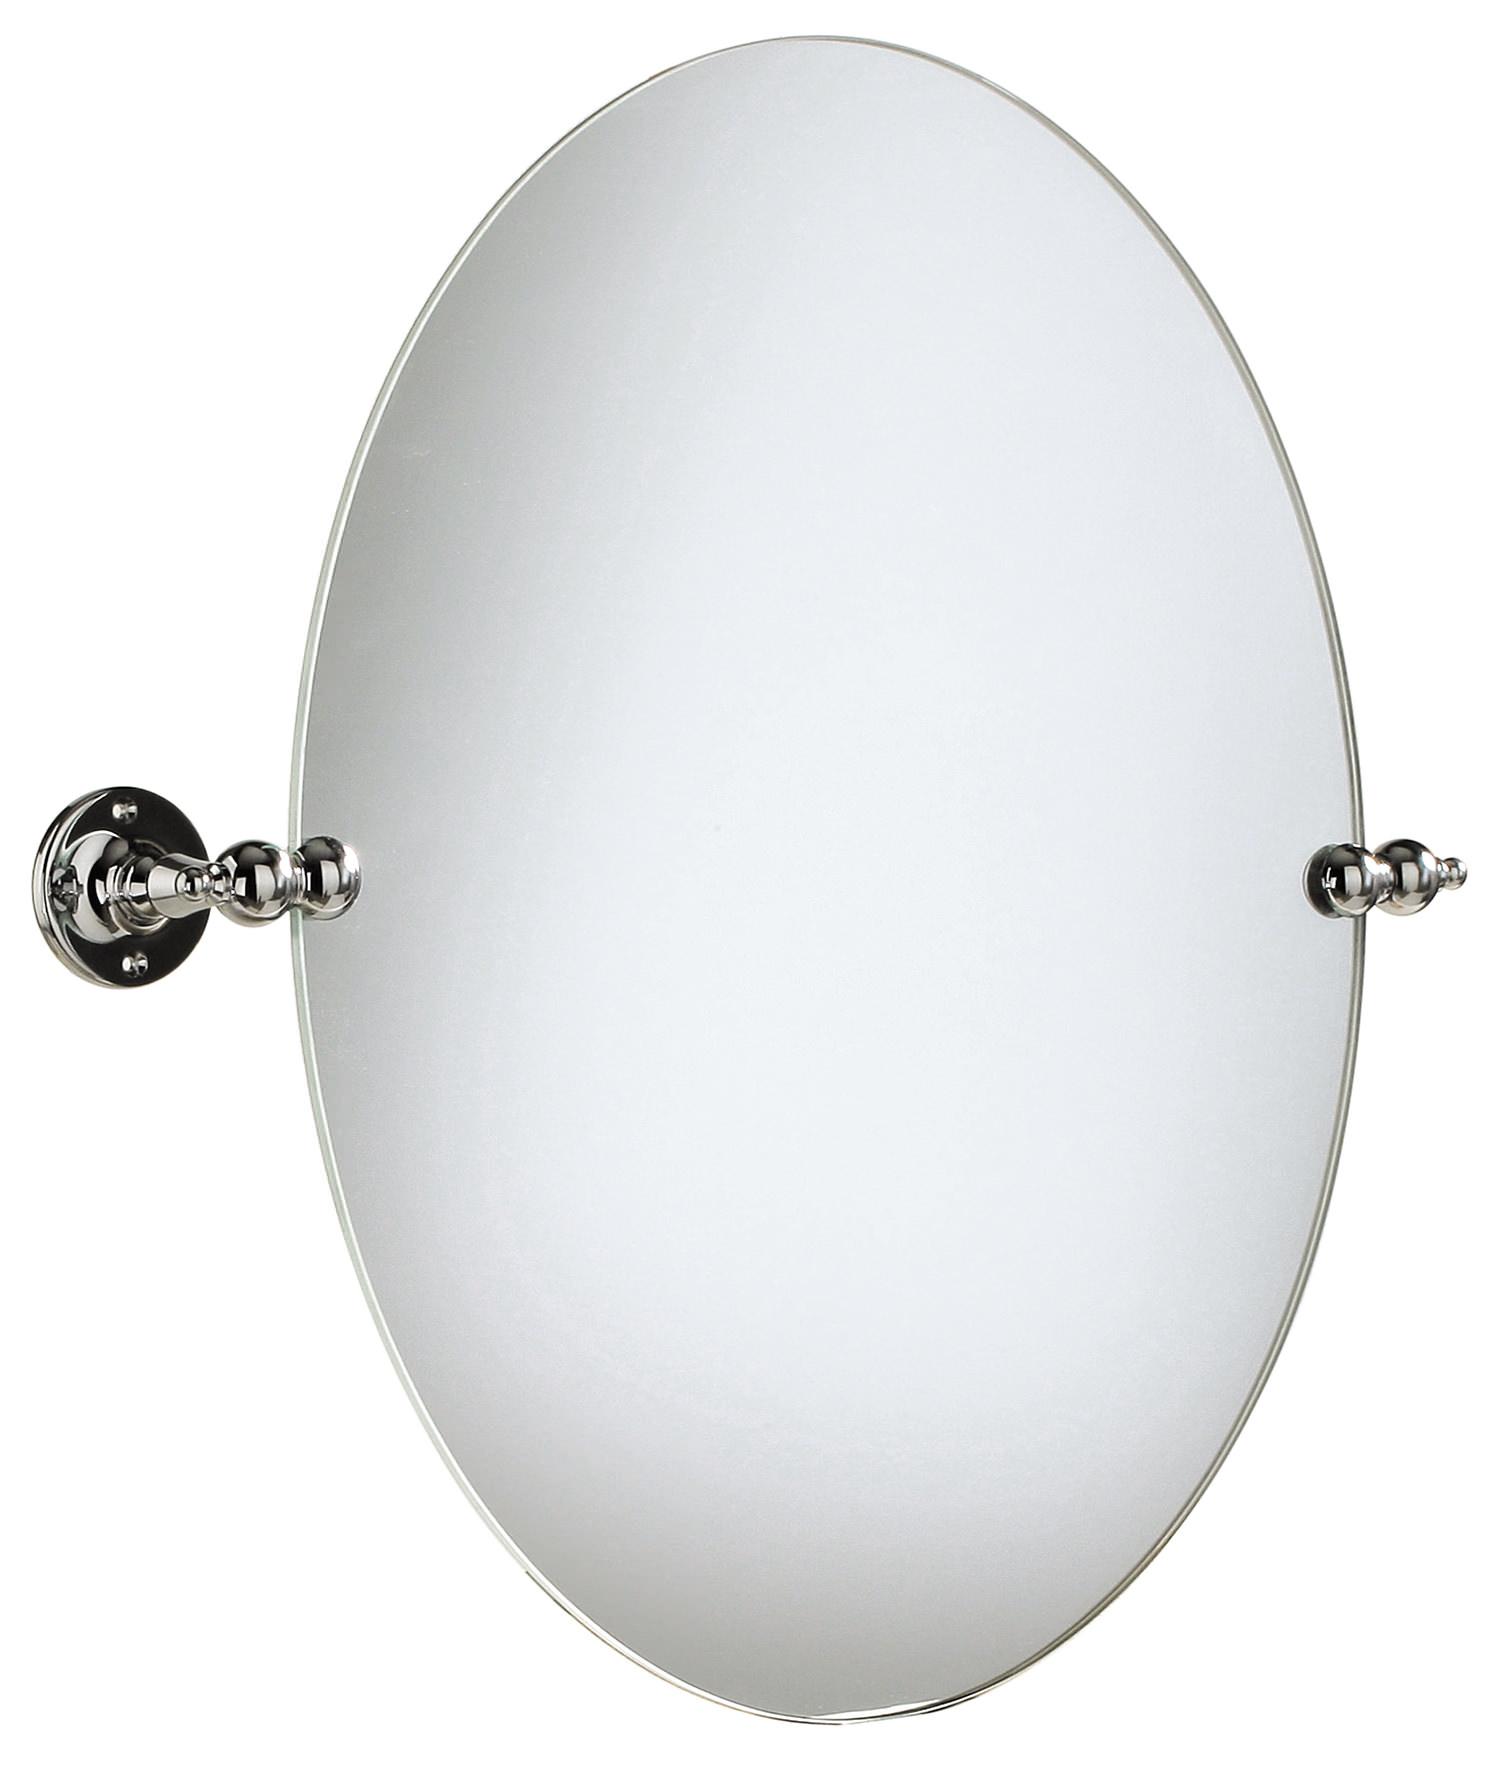 Heritage oval swivel mirror chrome ahc17 for Oval swivel bathroom mirror